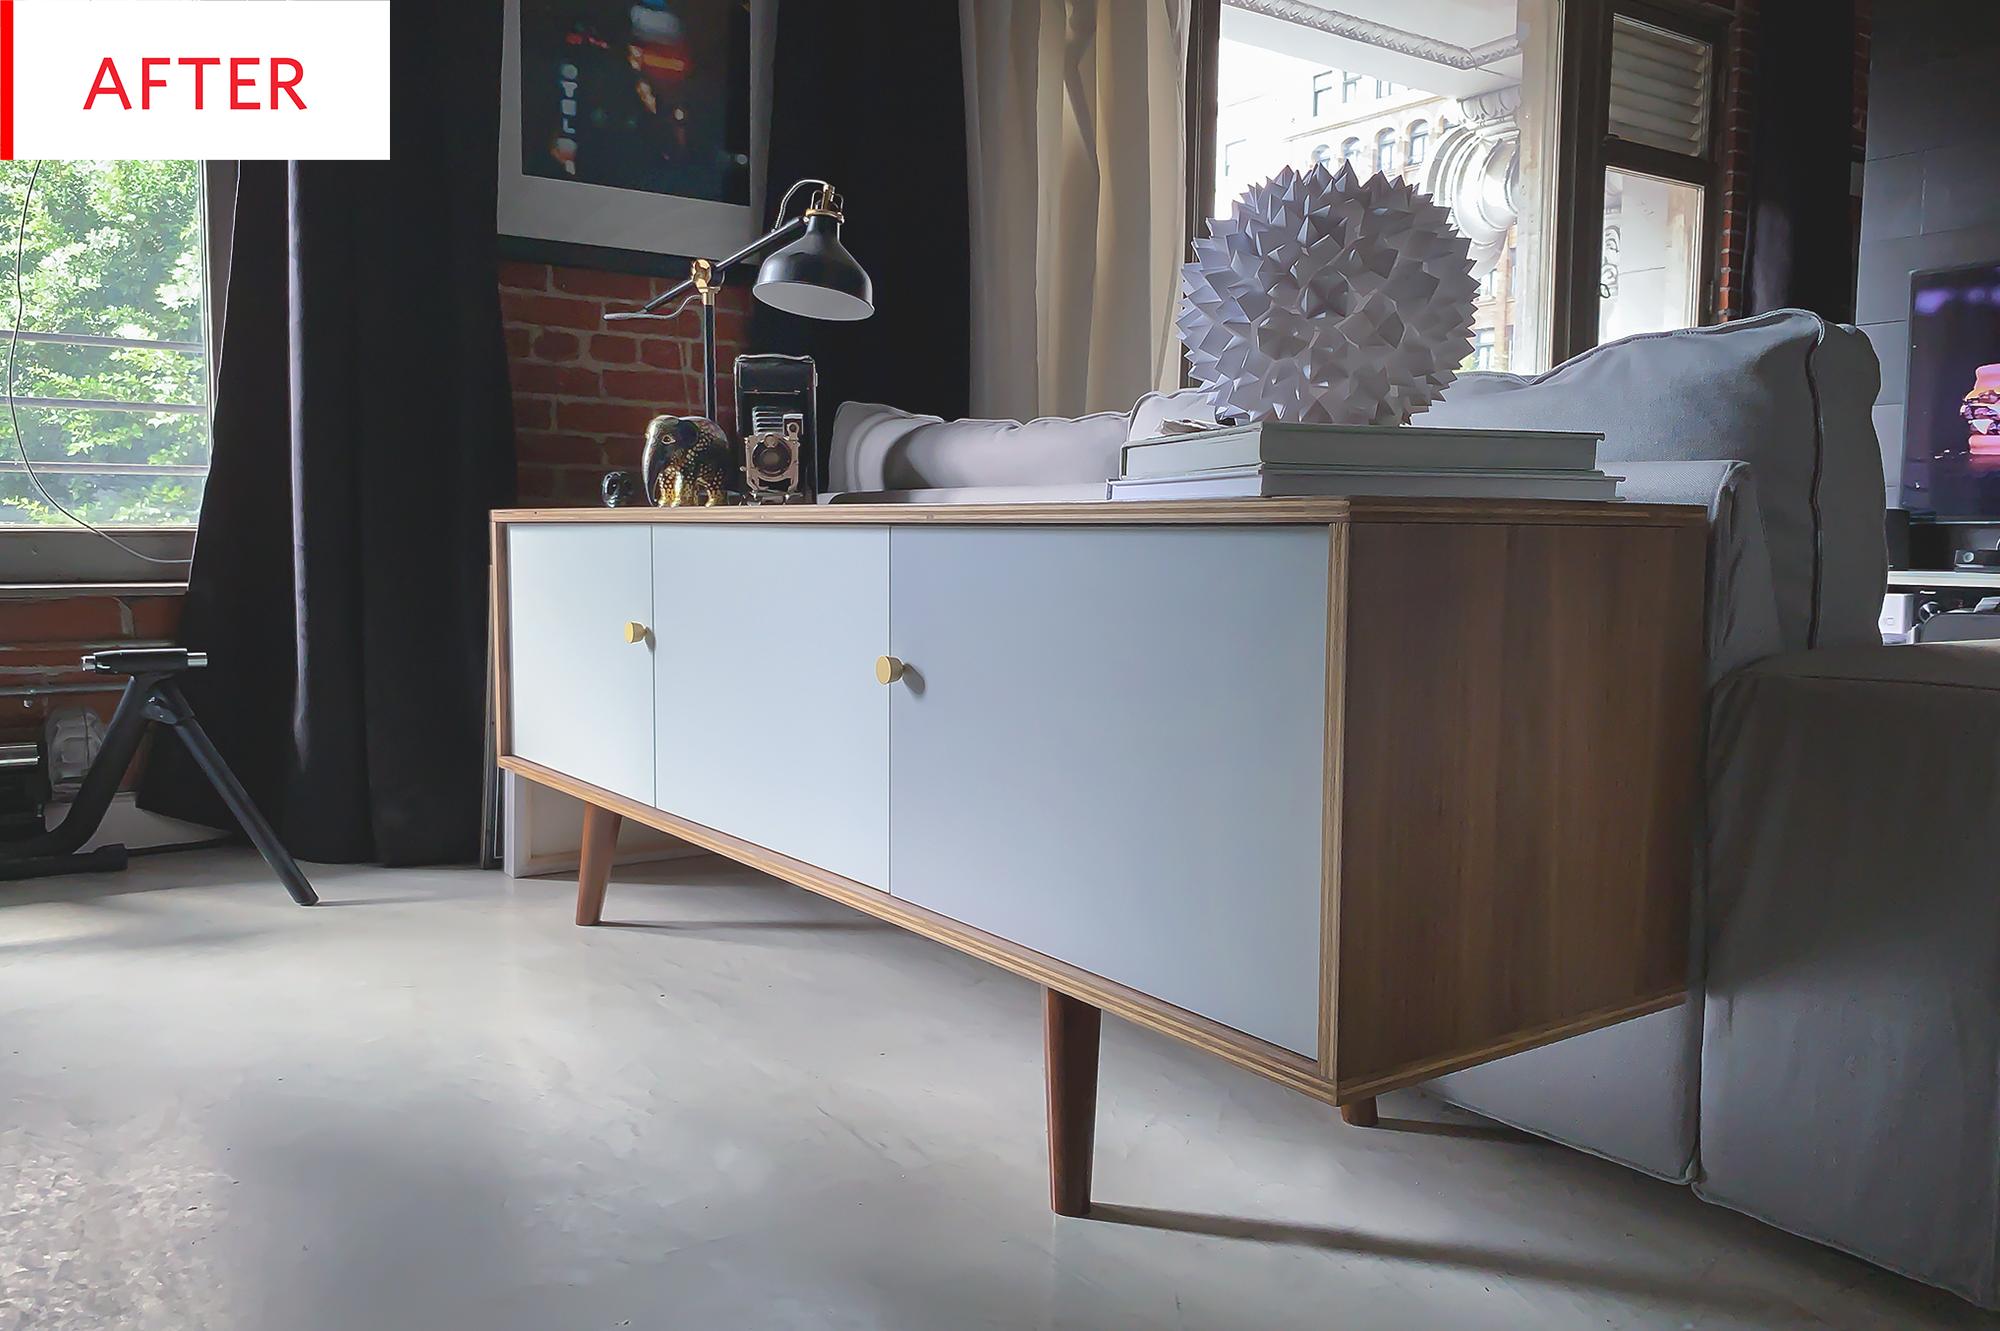 Ikea Besta Mid Century Modern Credenza Hack Photos Apartment Therapy